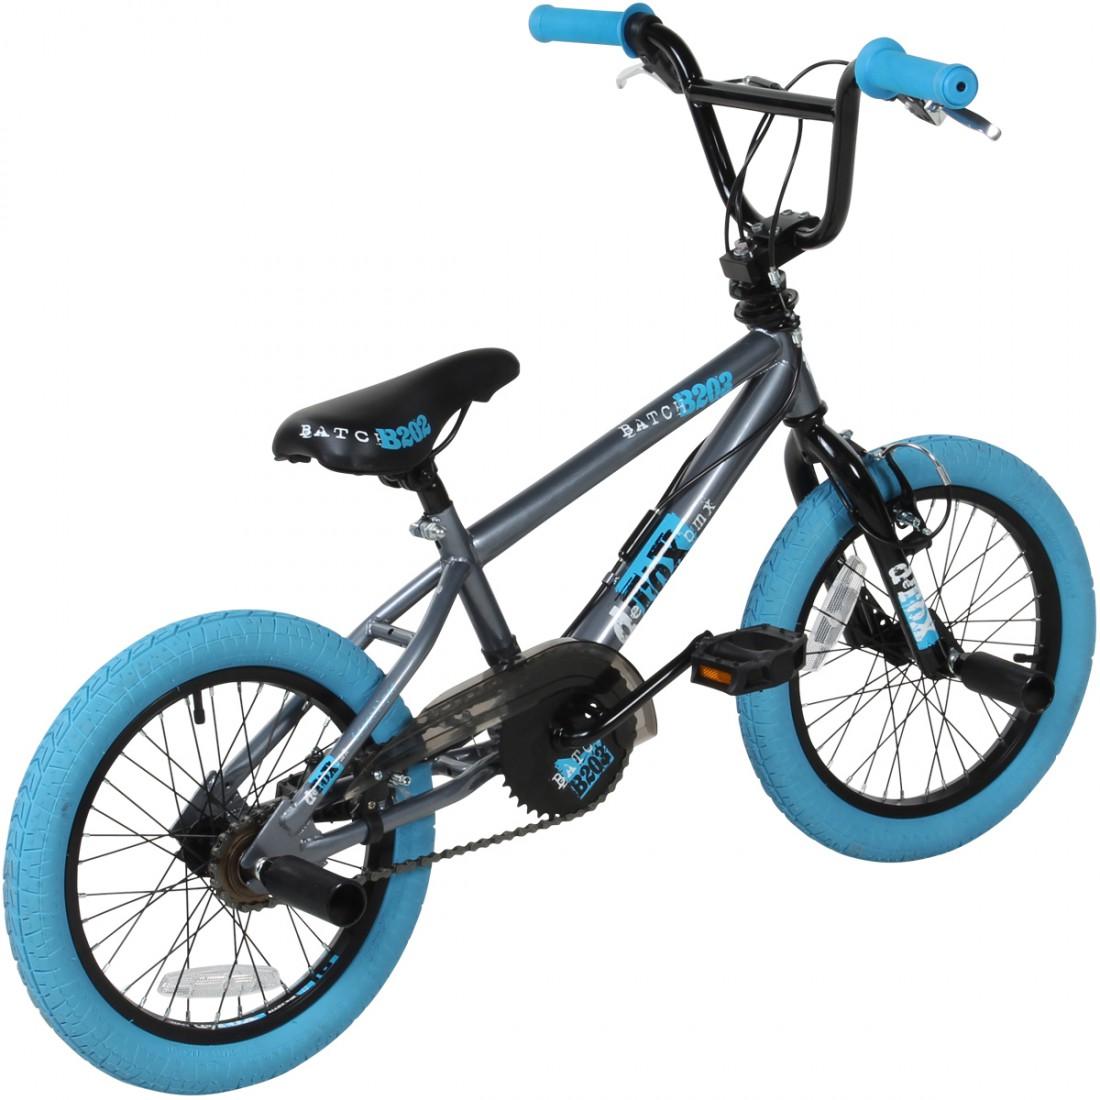 16 zoll bmx detox bike fahrrad freestyle kinderfahrrad. Black Bedroom Furniture Sets. Home Design Ideas